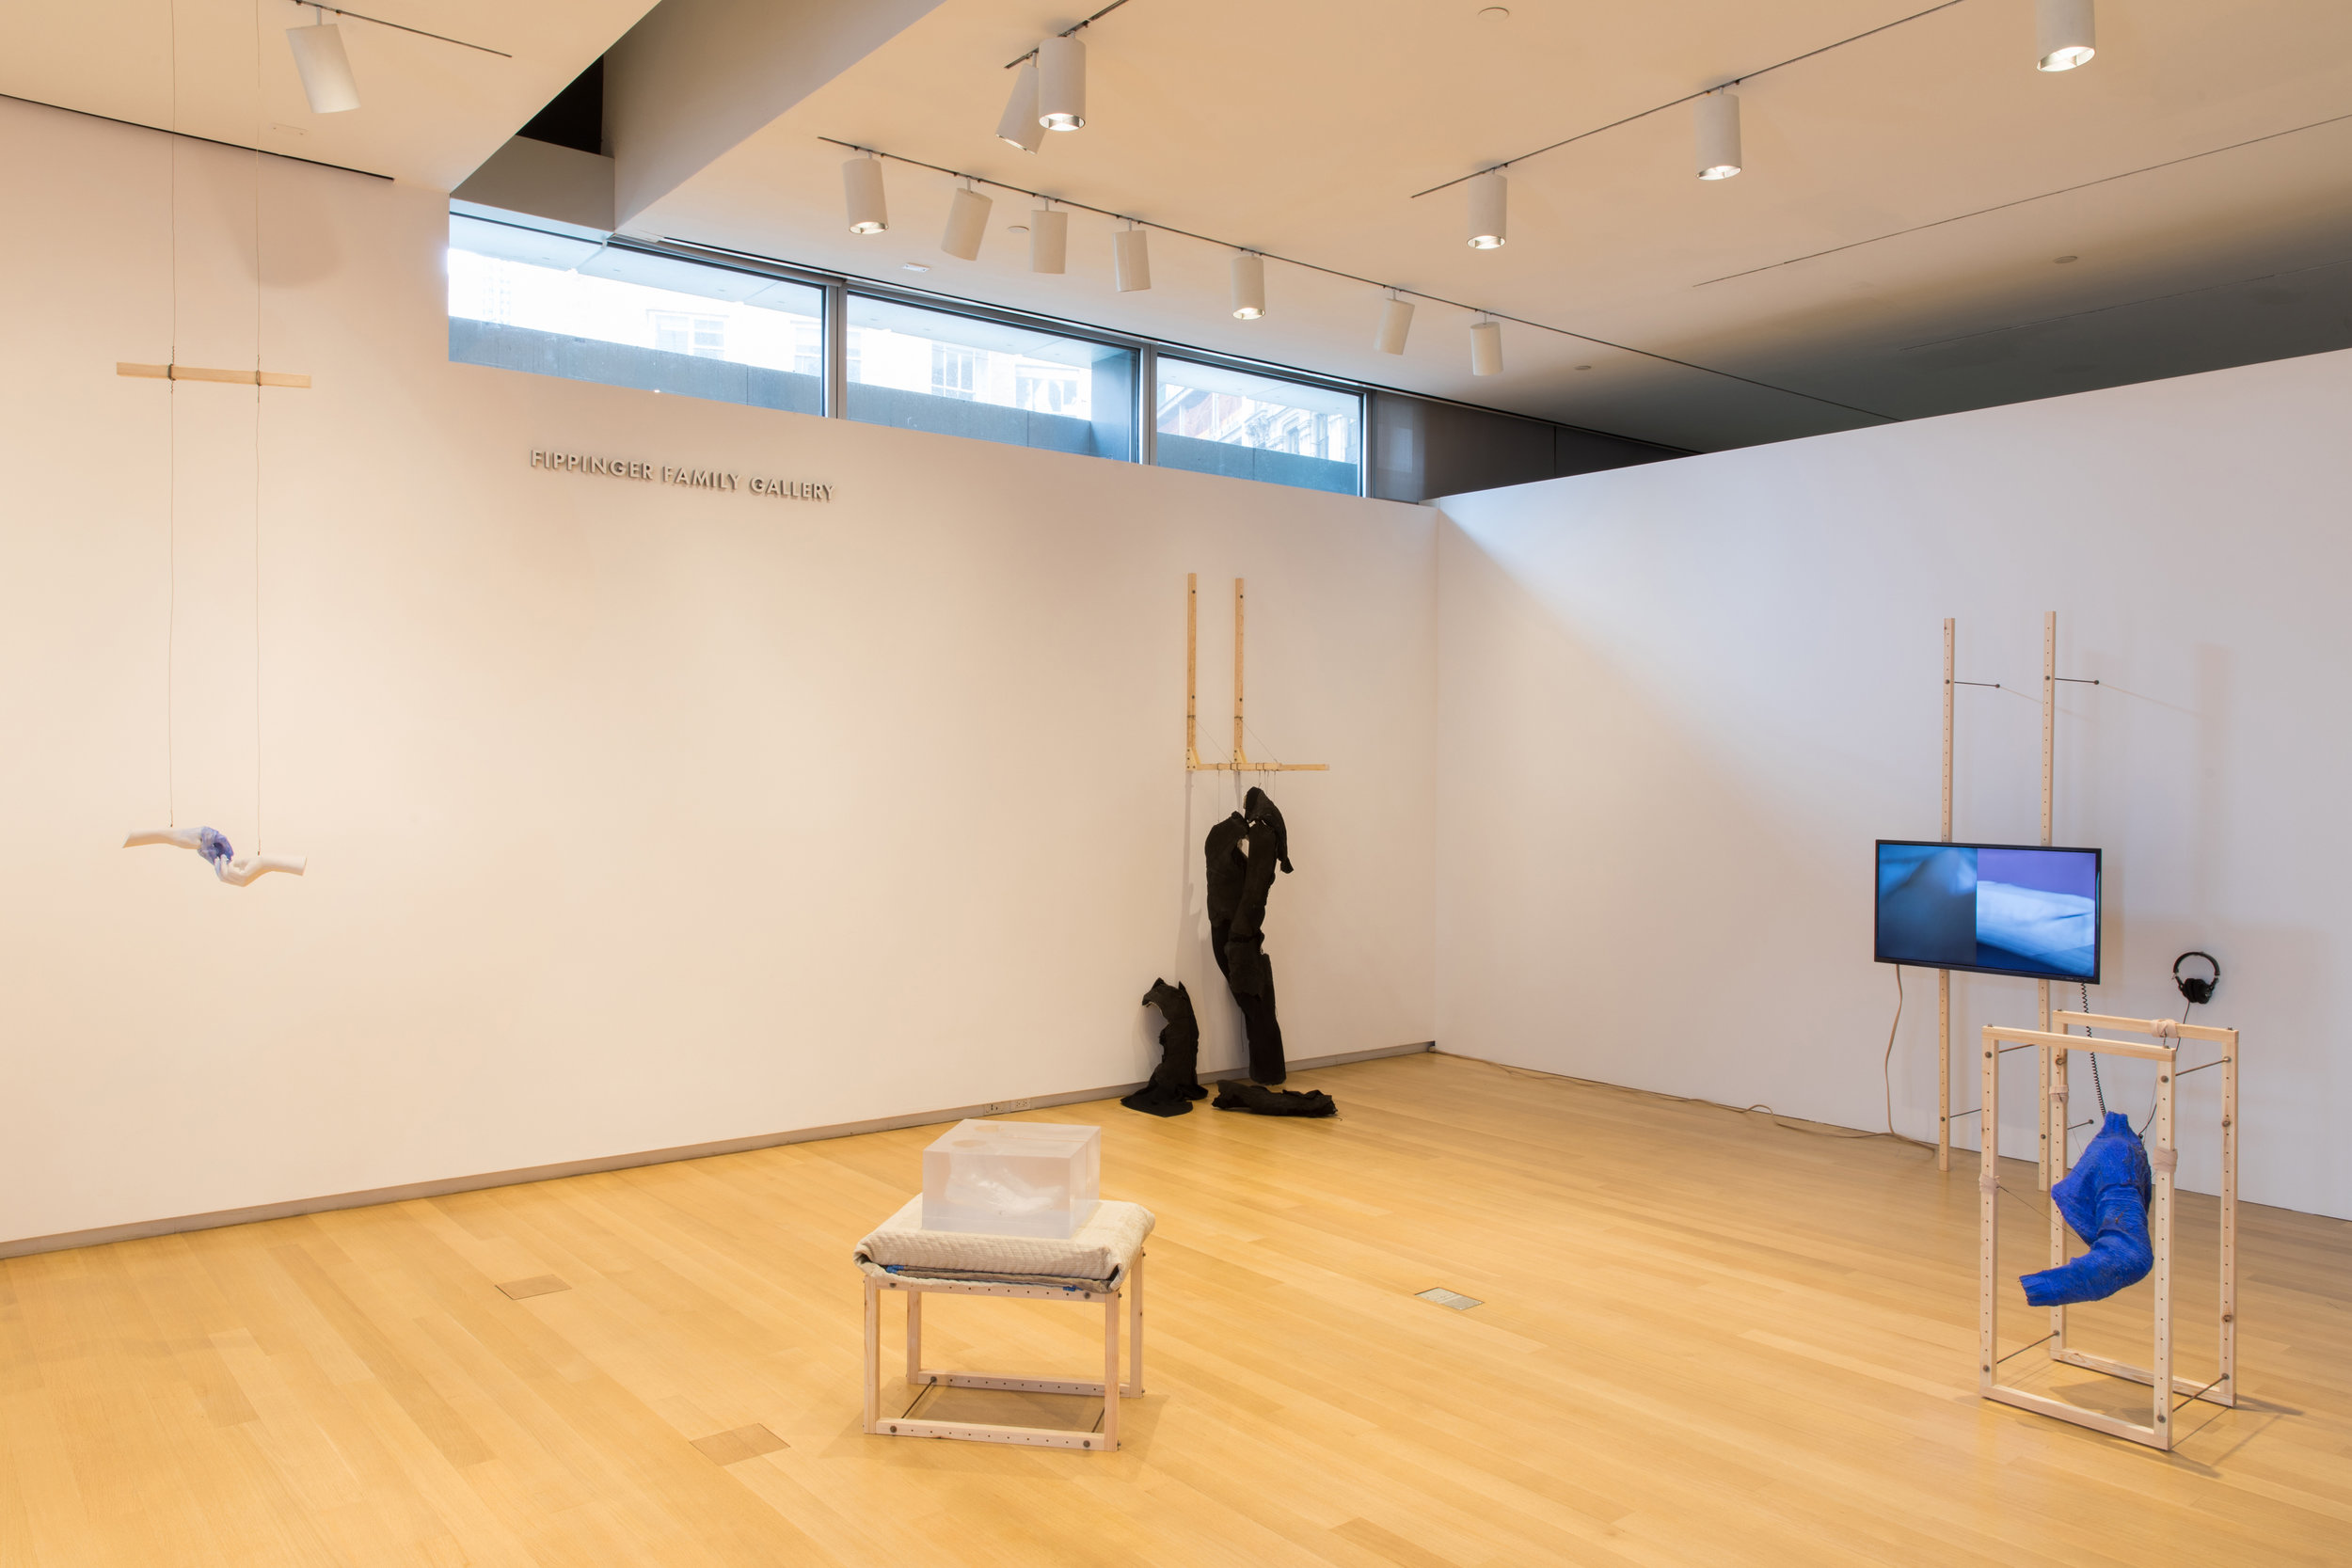 ensæmble, INSIDE, site-specific installation, 2017